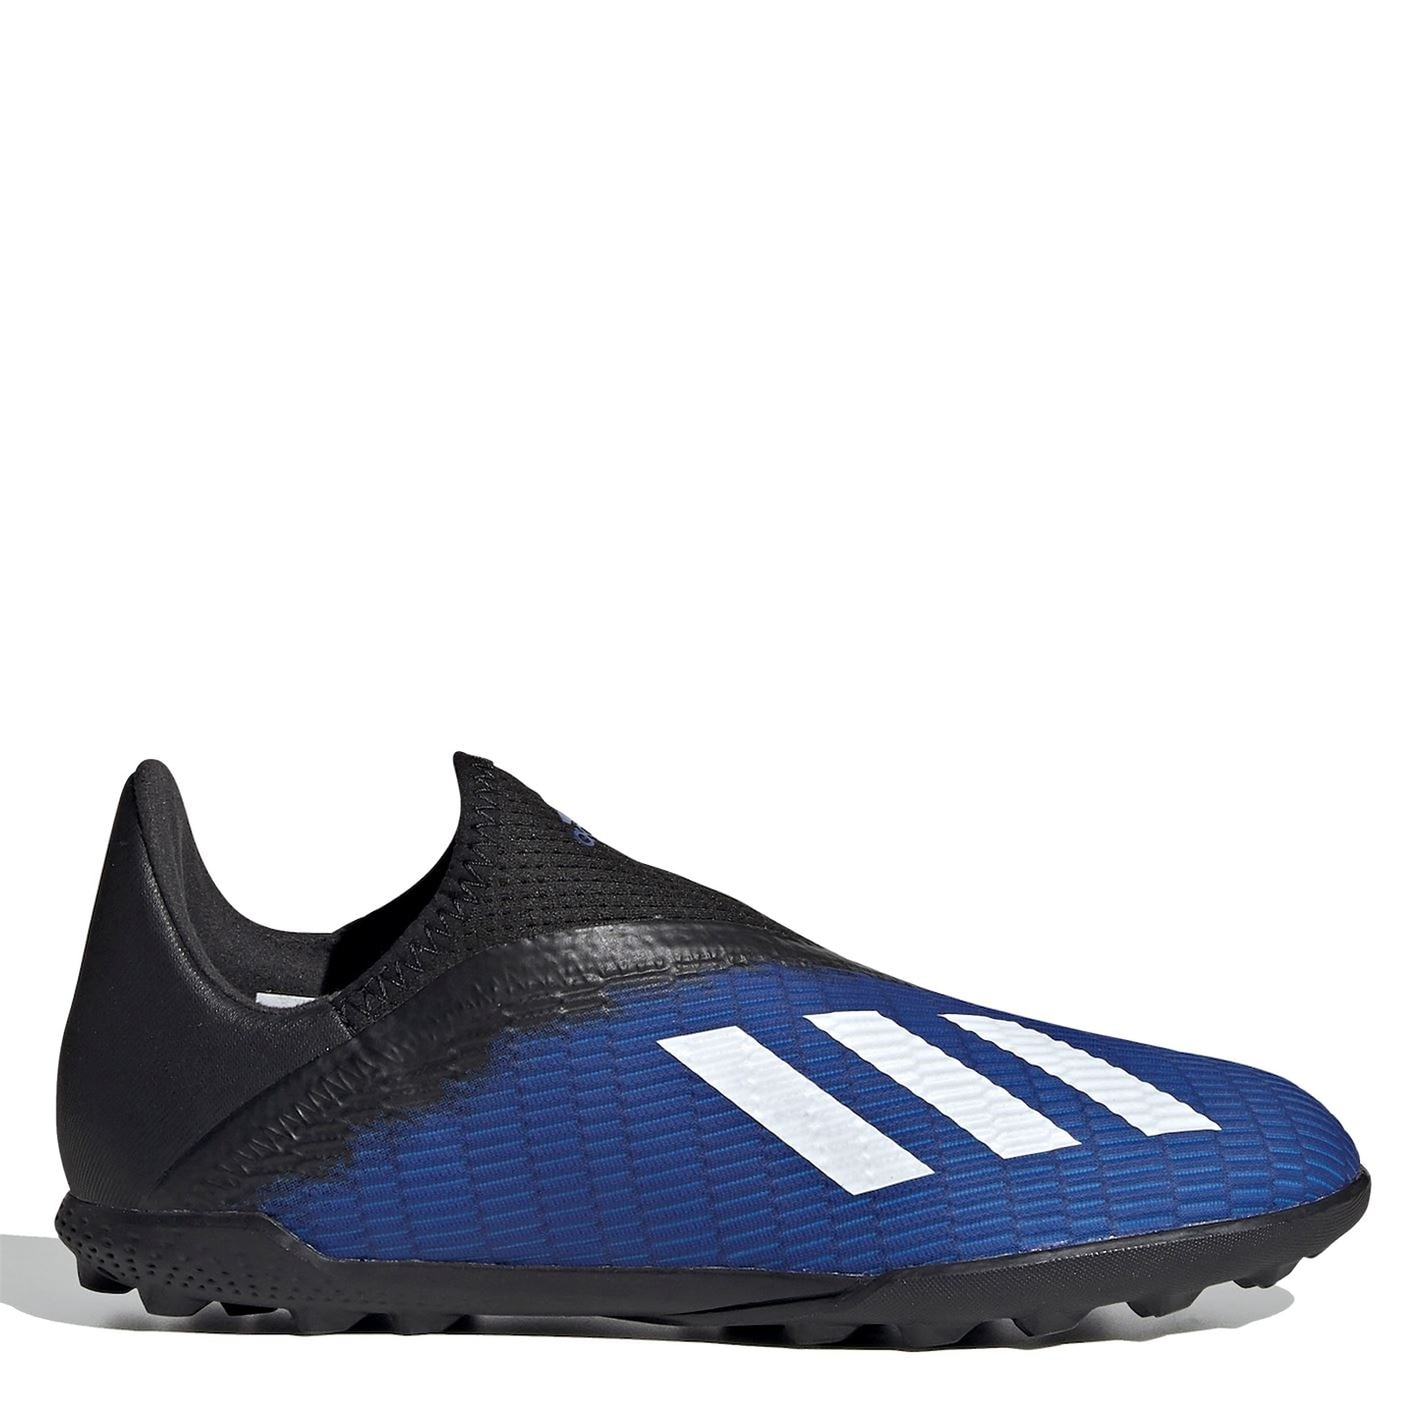 adidas astro turf trainers girls